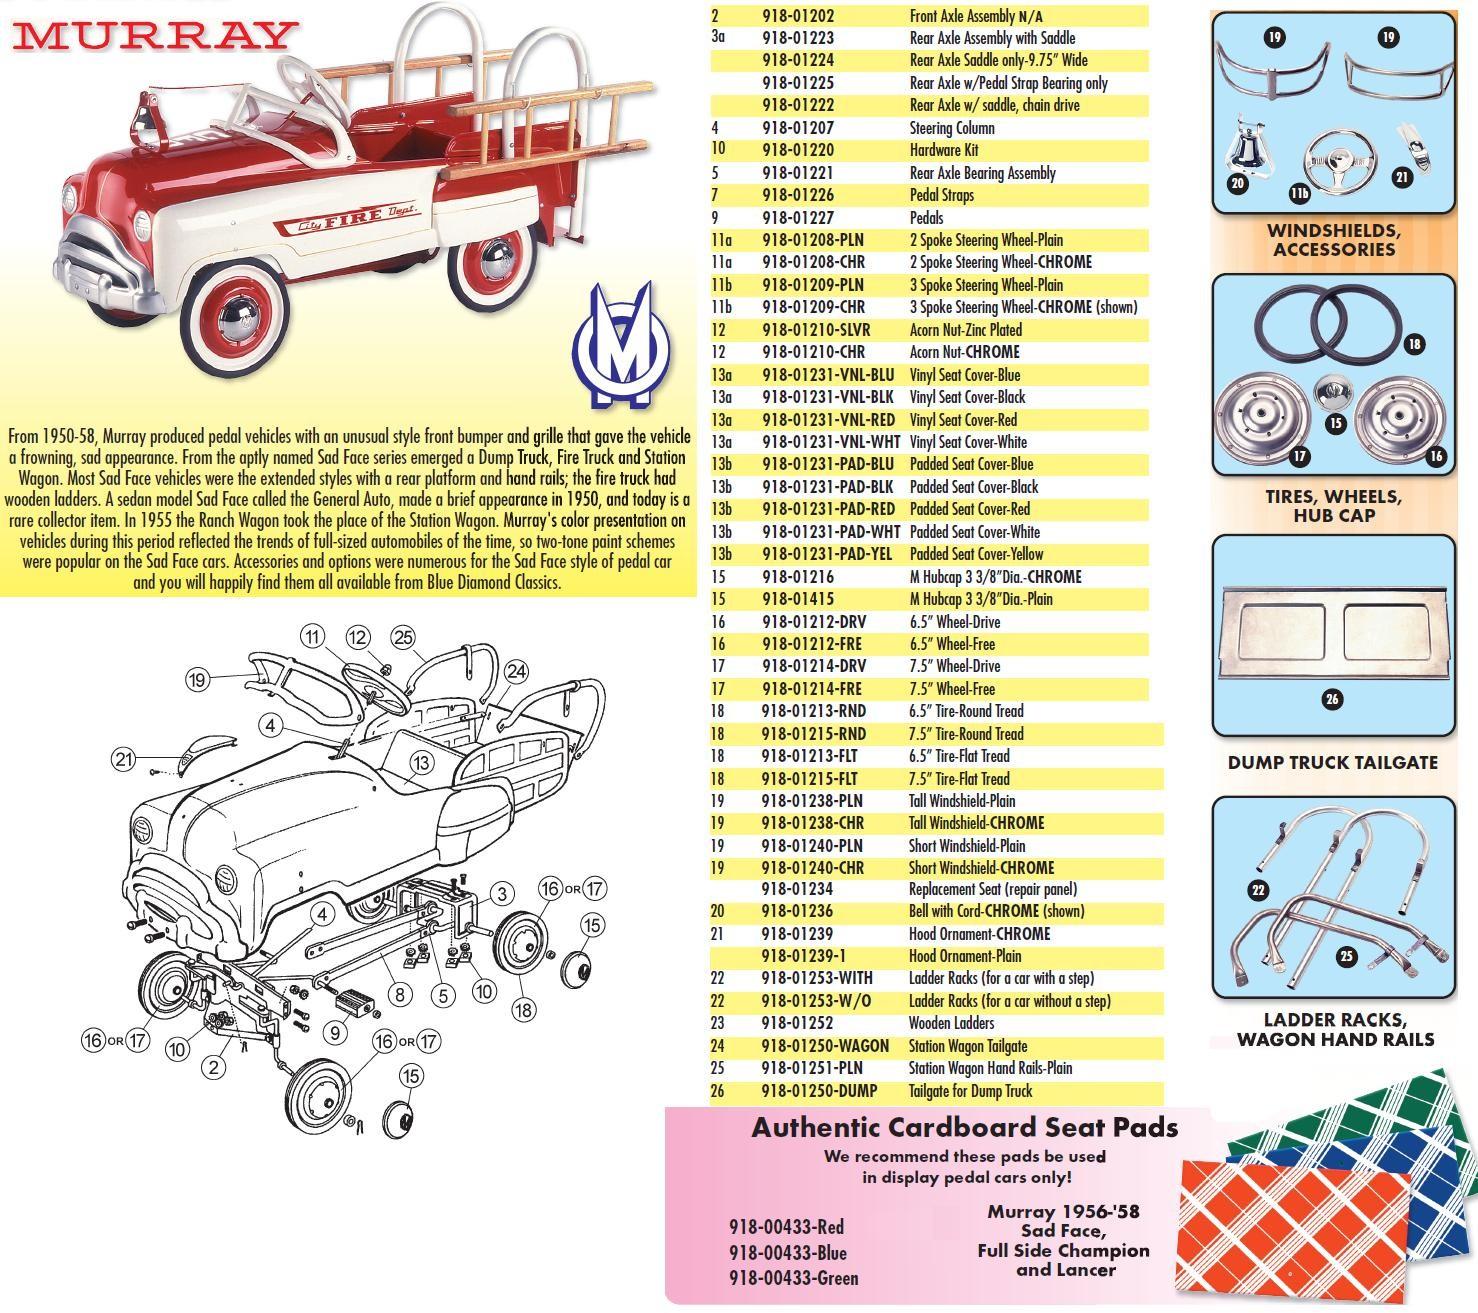 Diagram Of Car Wheel Parts Pedal Car Parts 7 1 2 Inch Tire Of Diagram Of Car Wheel Parts